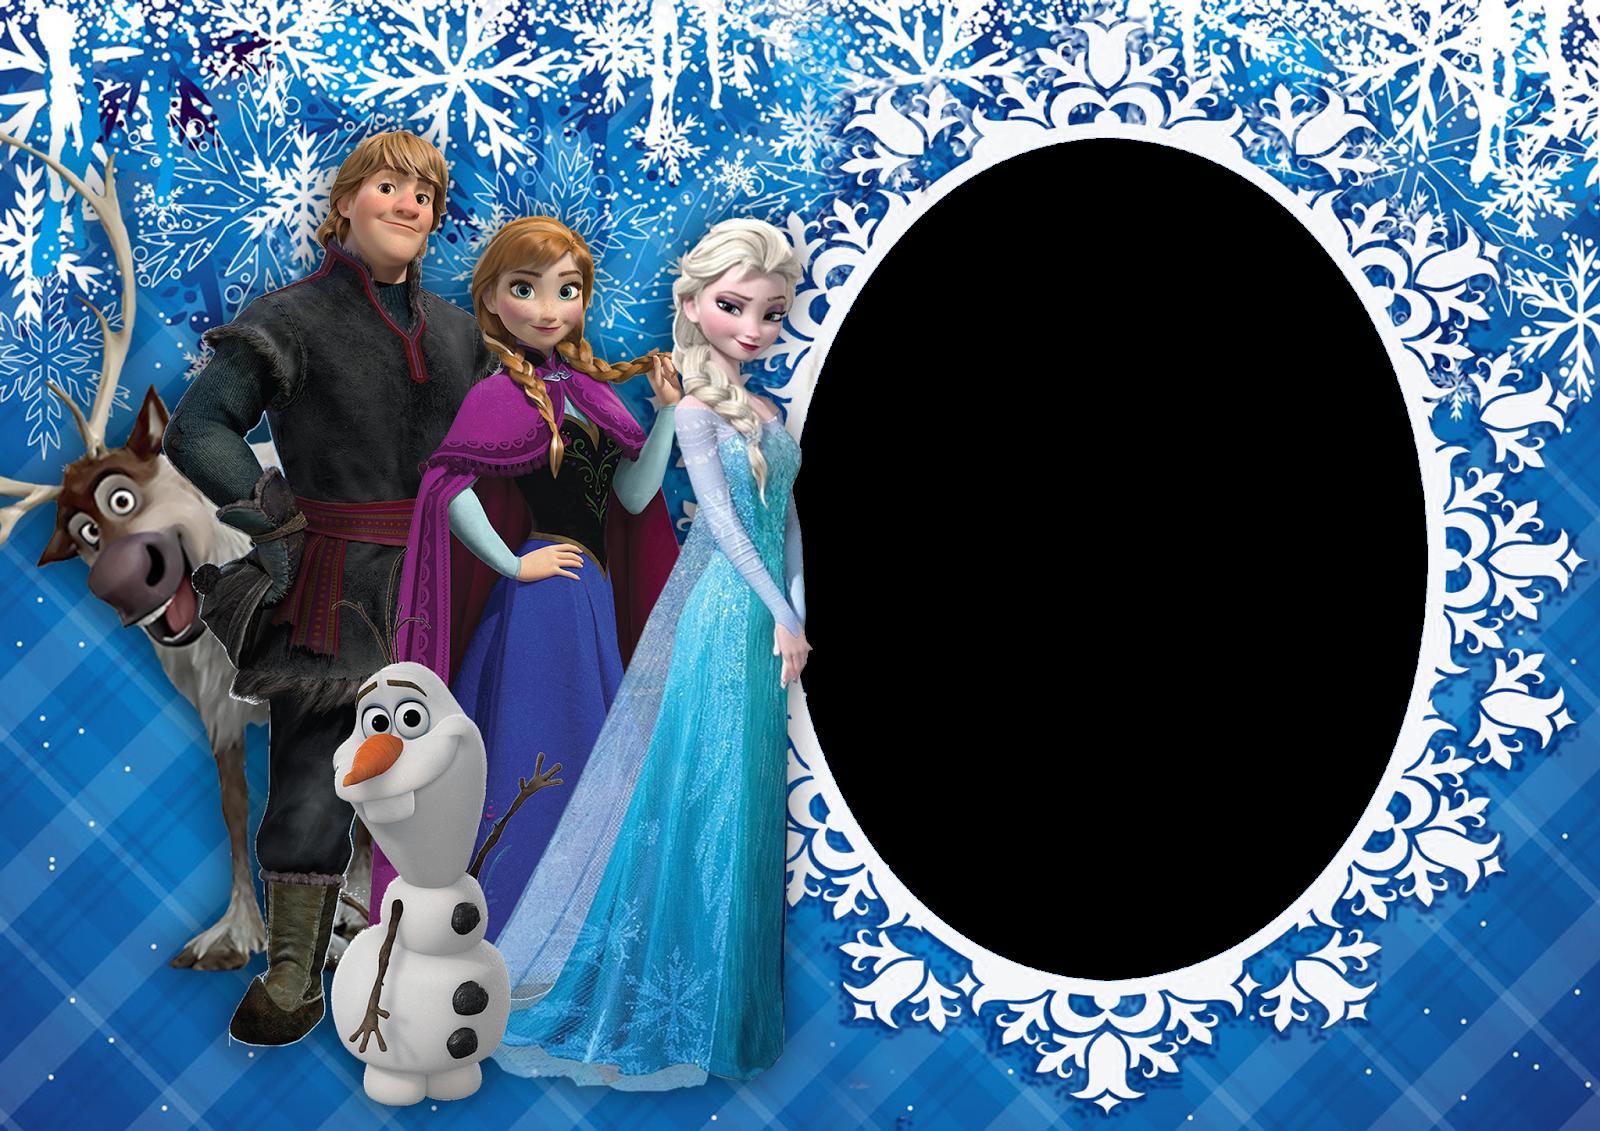 Artes da Festa Moldura do Frozen Molduras, Frozen, Festa